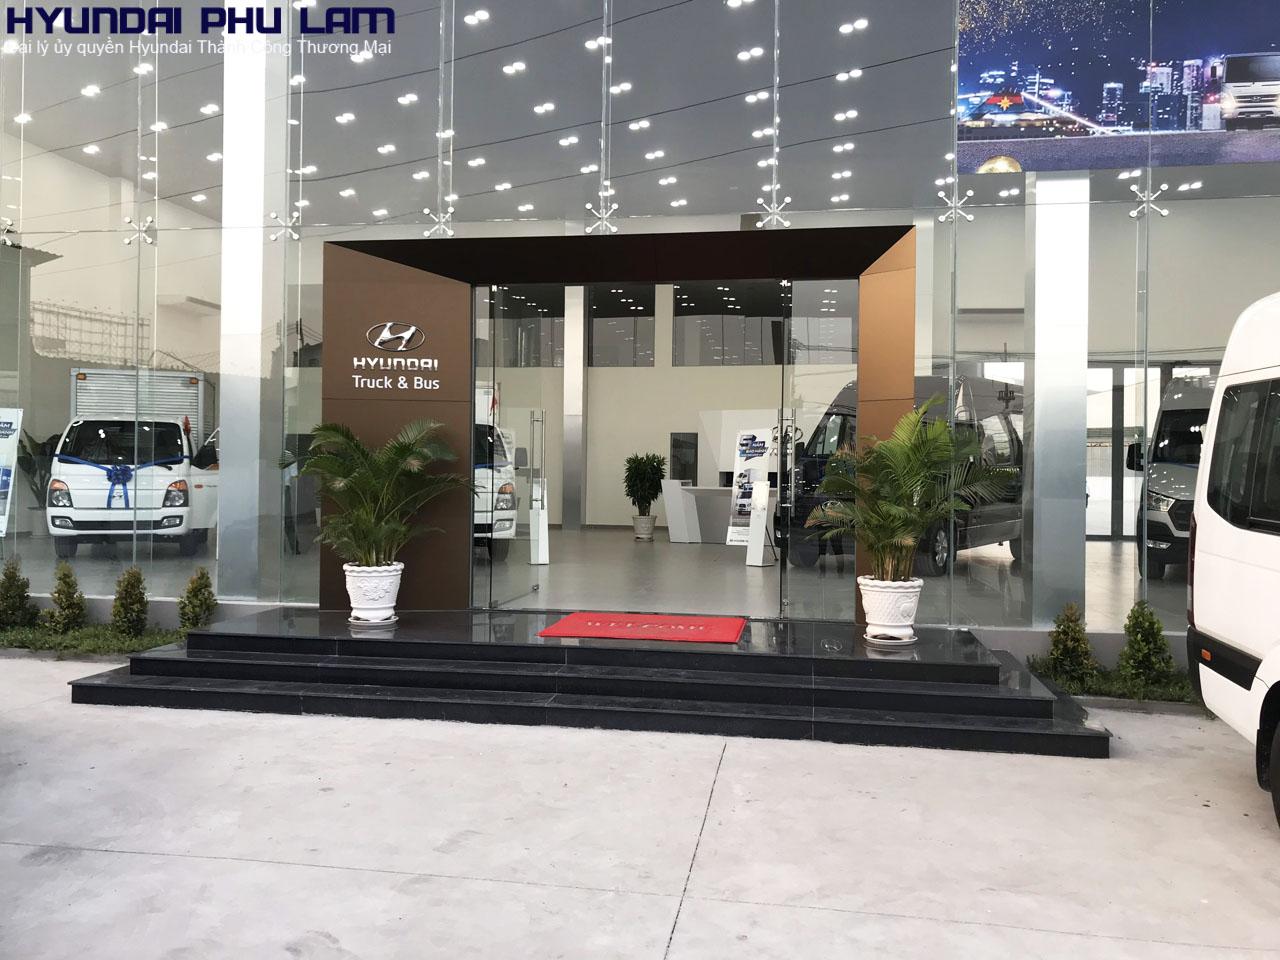 Hyundai-phu-lam Giới thiệu | Hyundai Phú Lâm